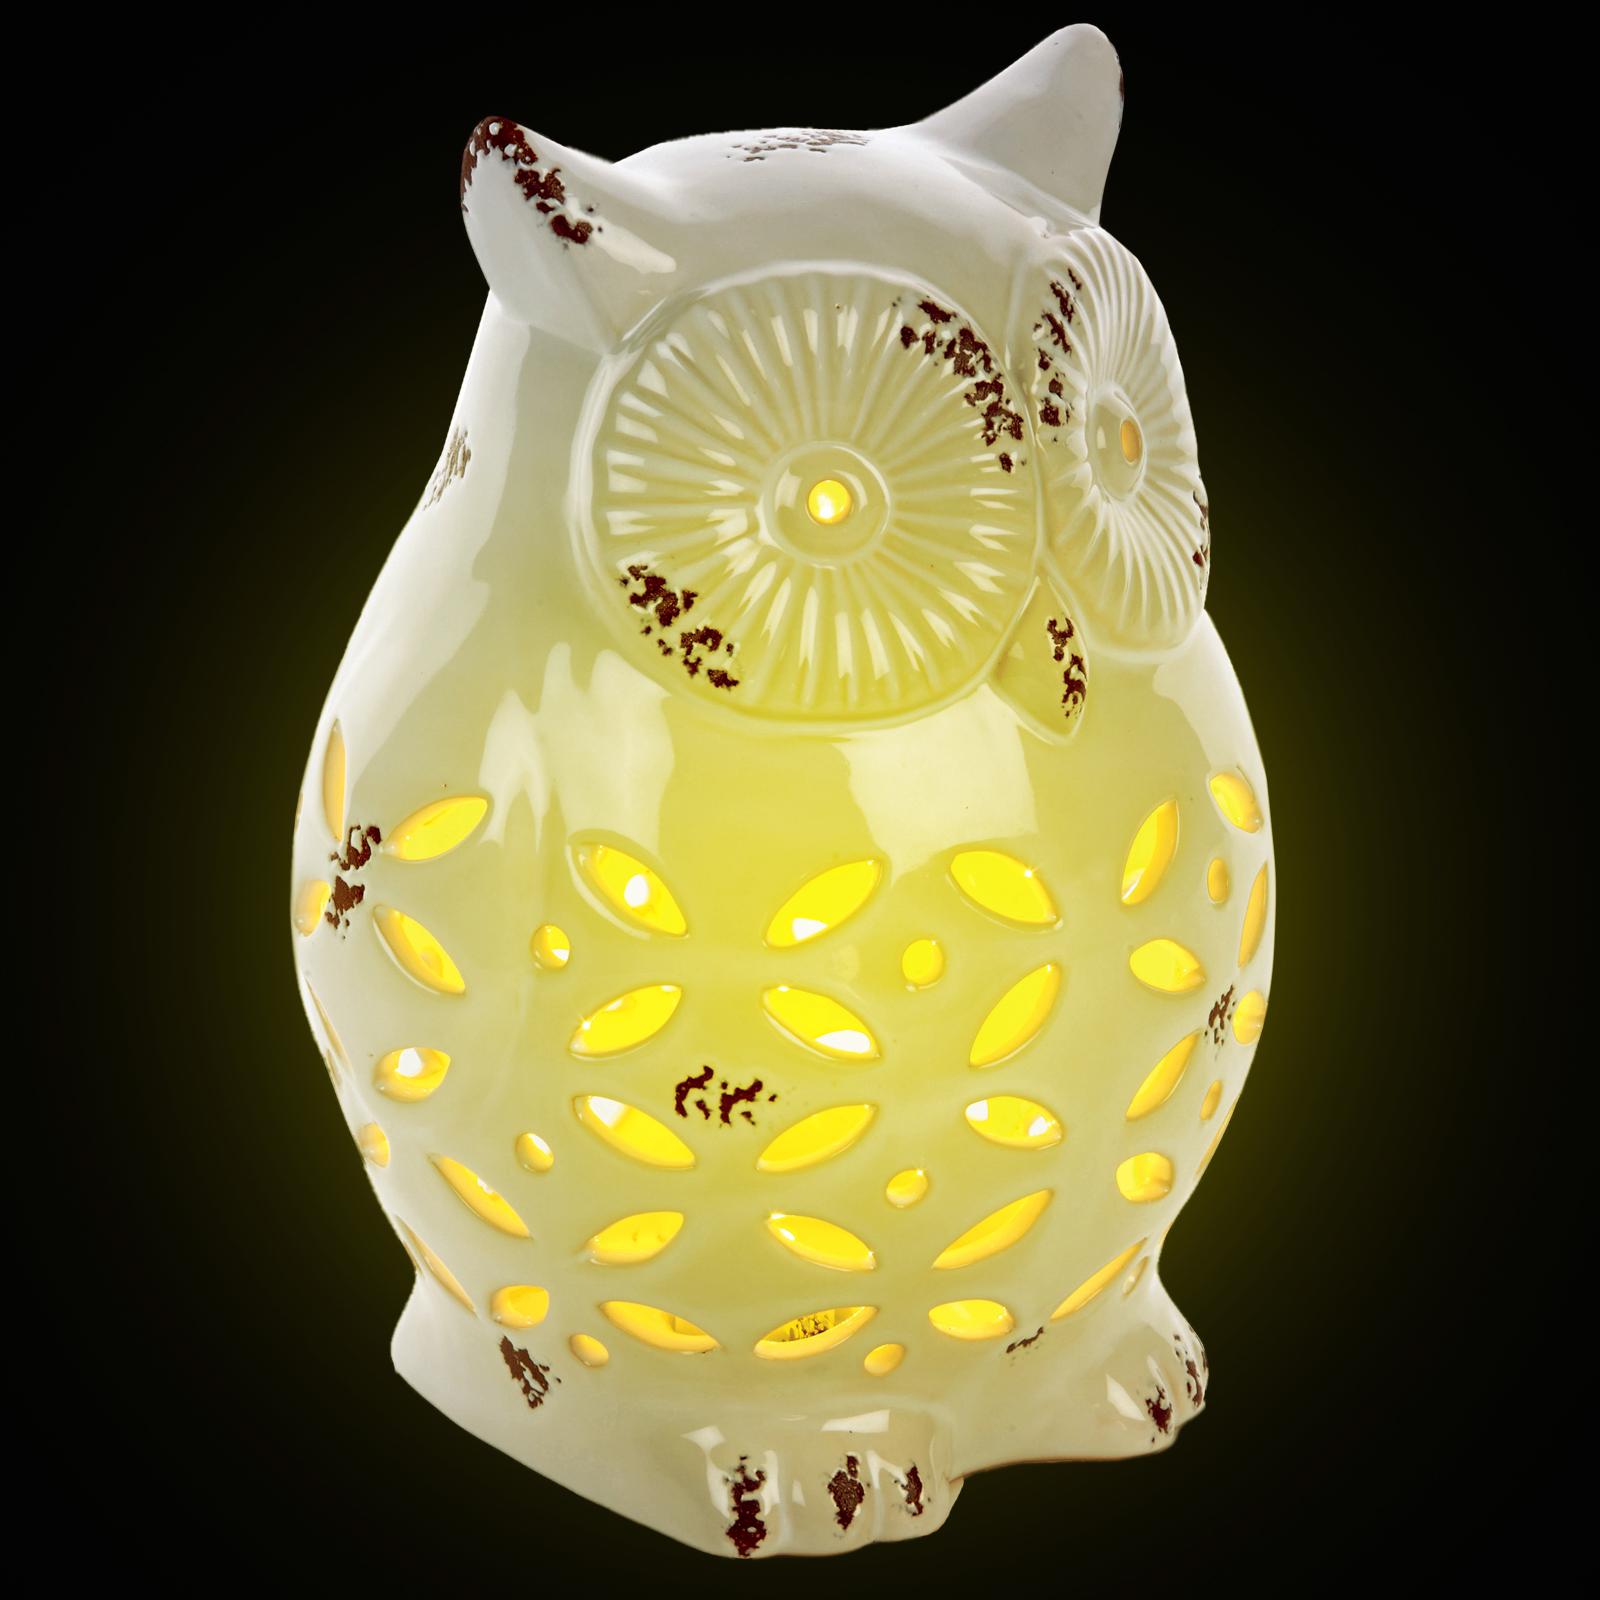 Silhouette Owl Lamp